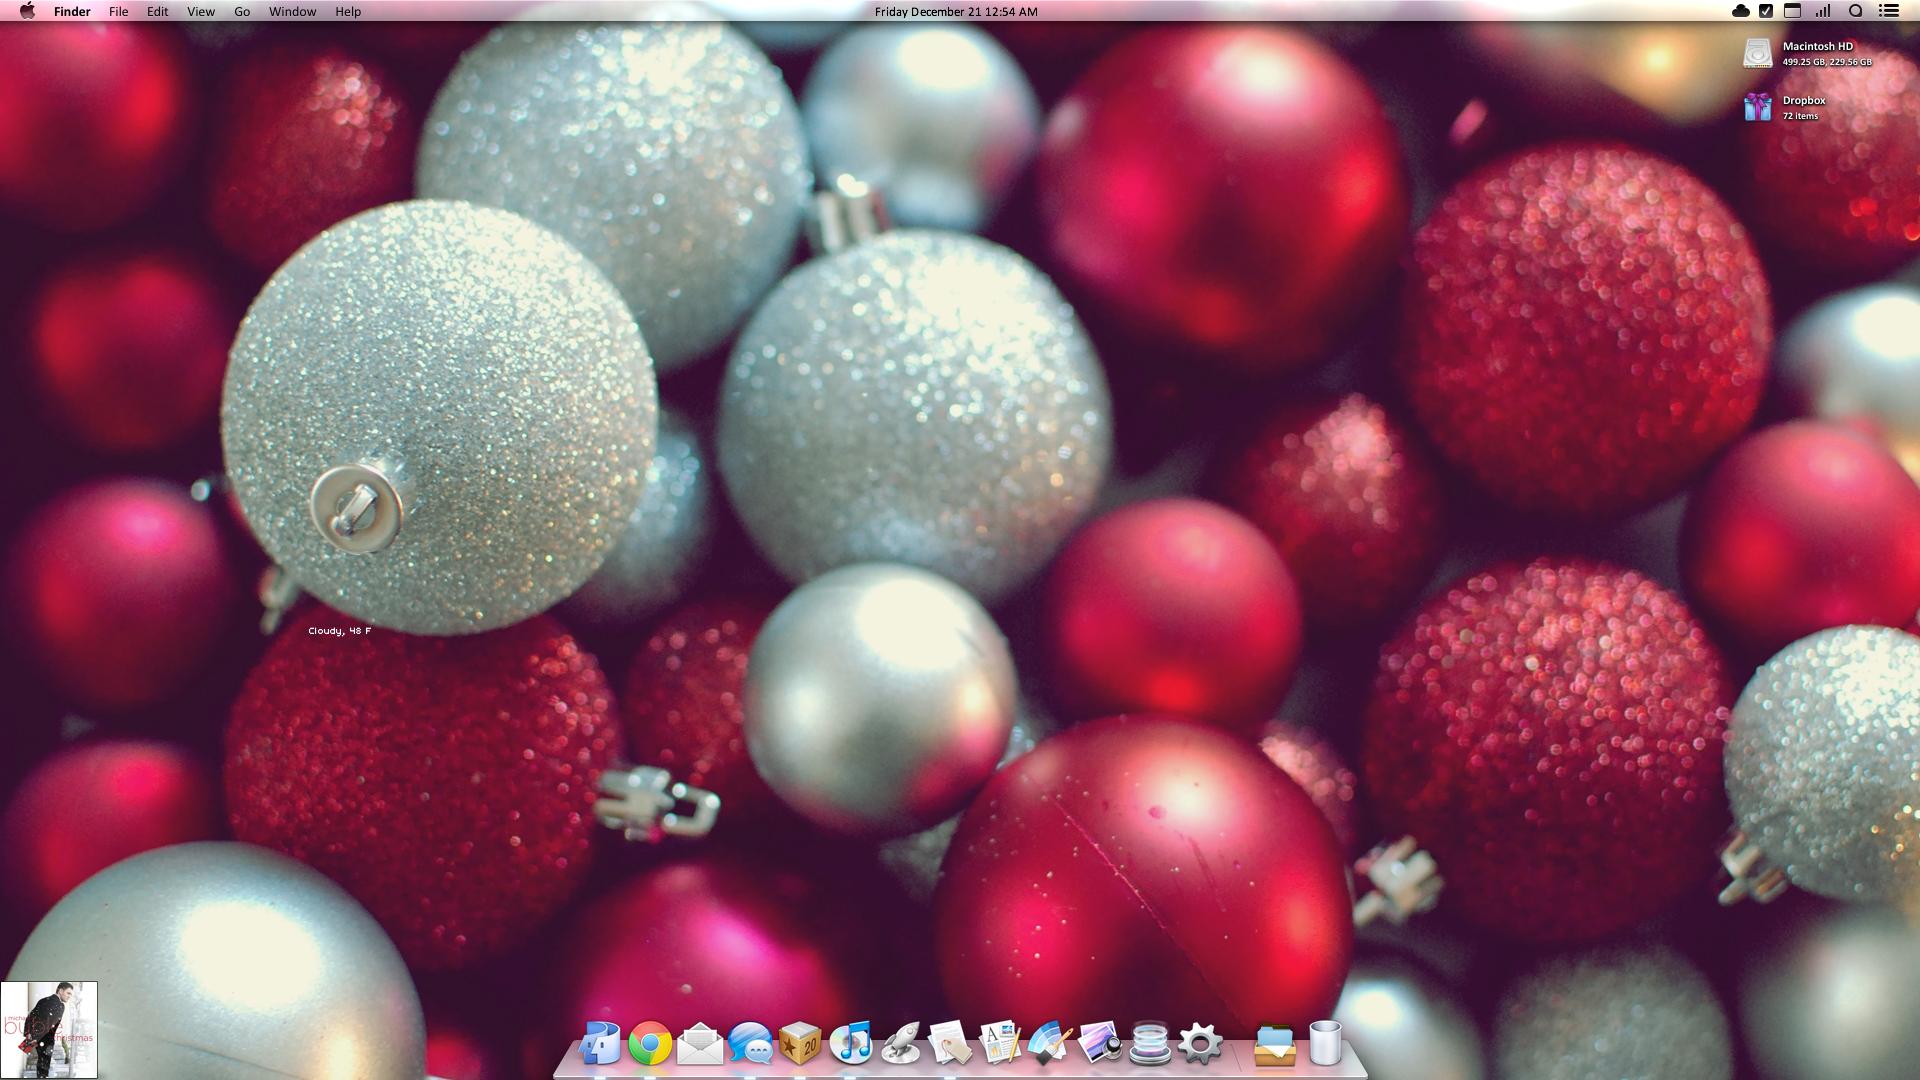 Happy Holidays by Senorj92